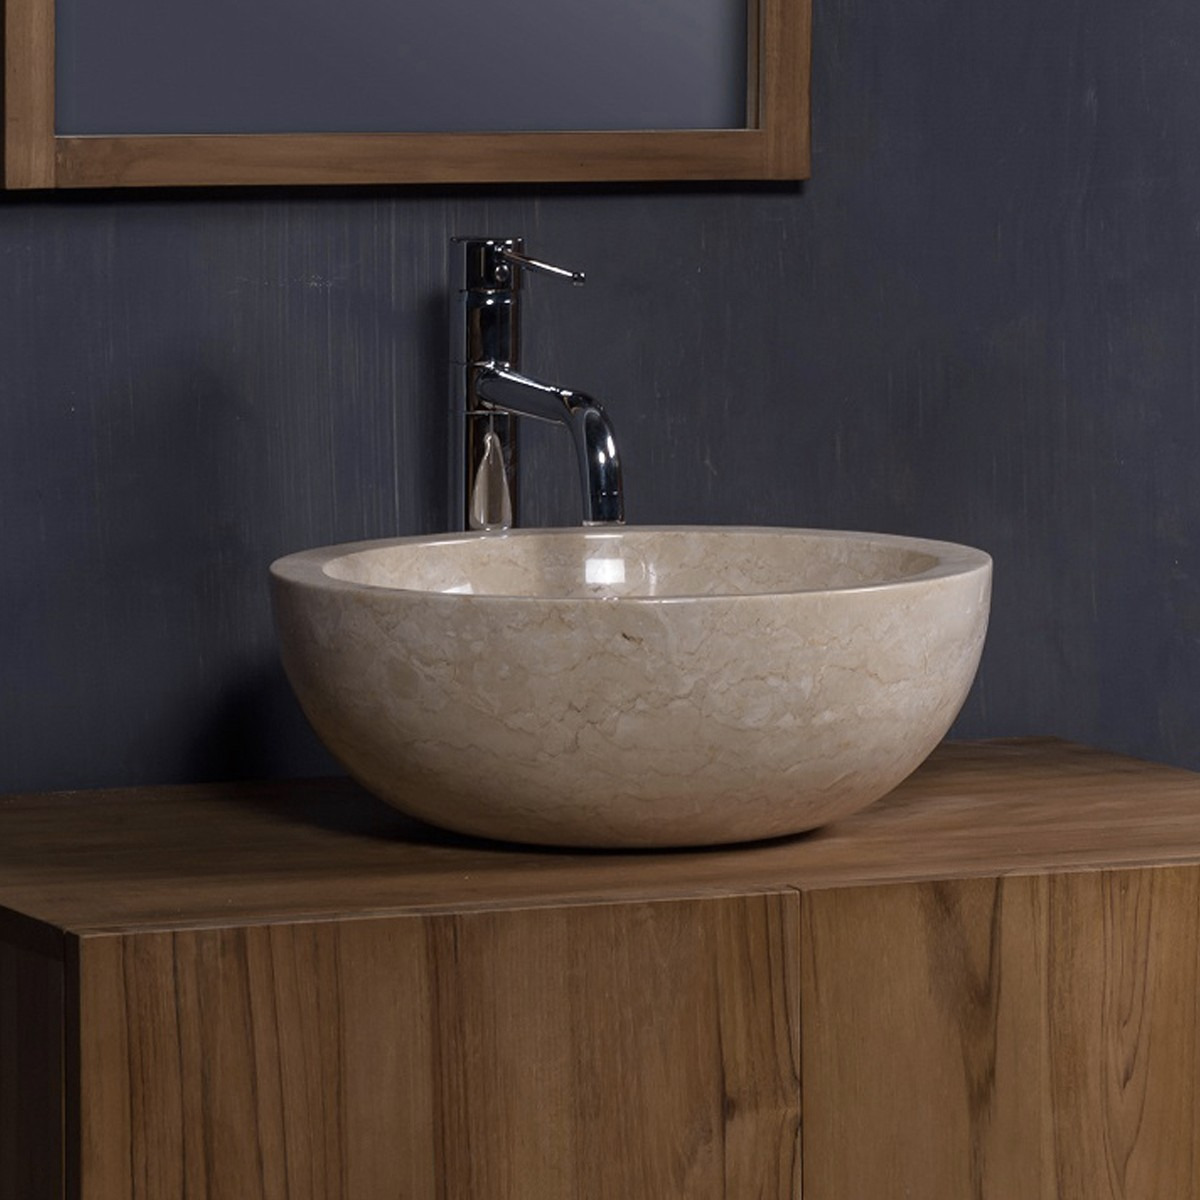 ensemble de salle de bain suspendu en bois de teck 80 cm - Ensemble Salle De Bain Teck